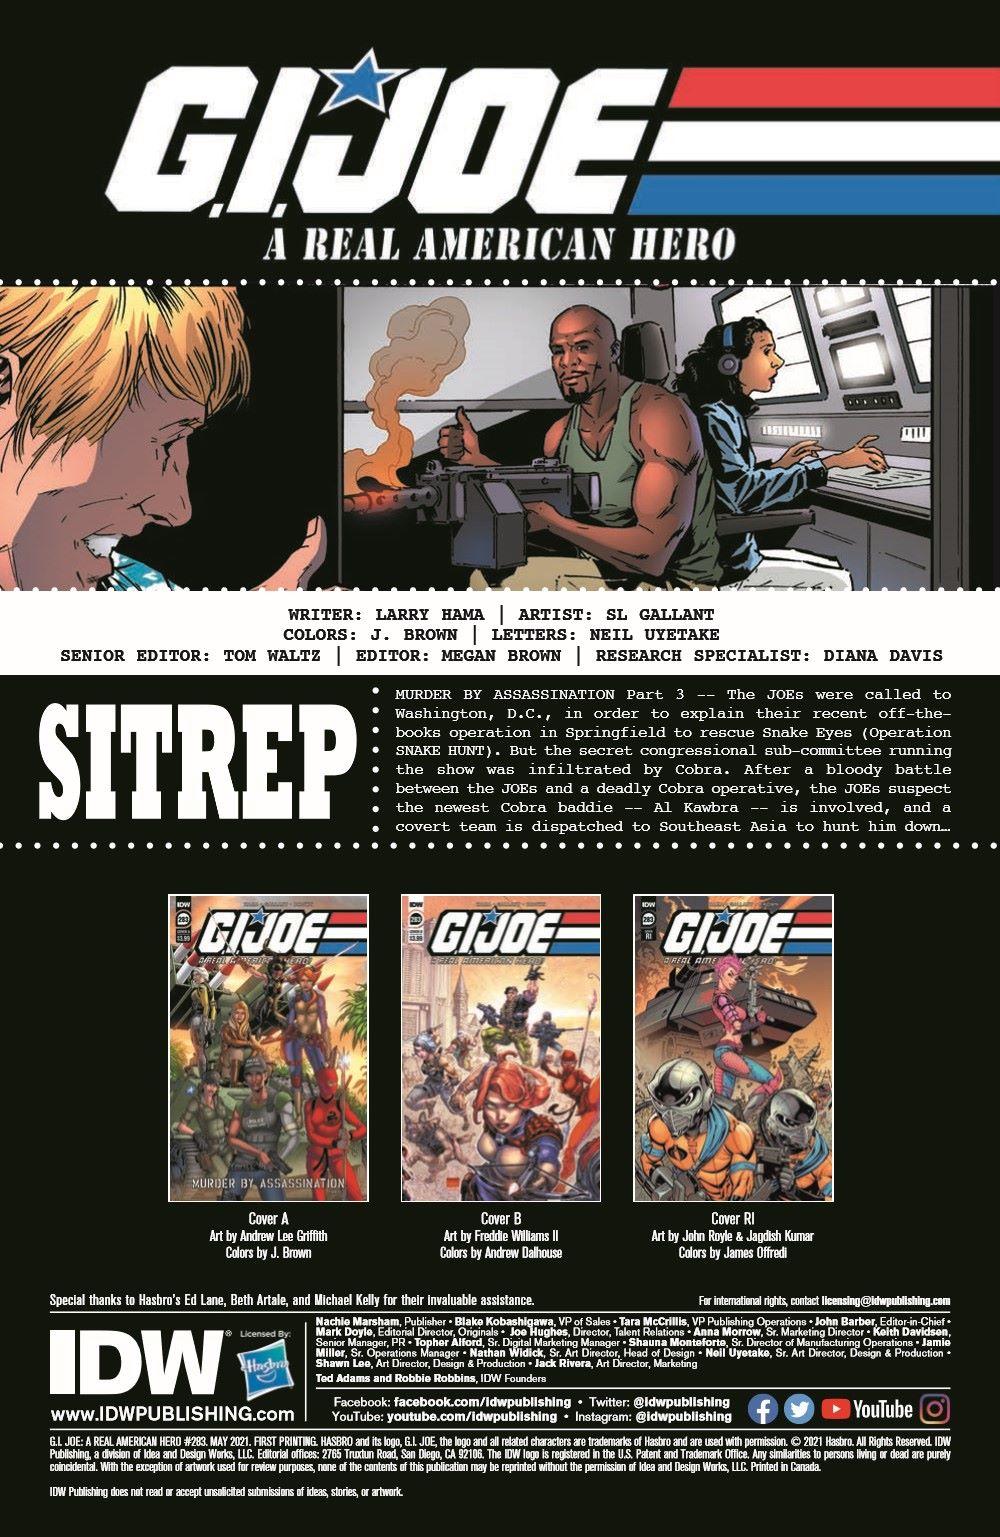 GIJoeRAH283-pr-2 ComicList Previews: G.I. JOE A REAL AMERICAN HERO #283